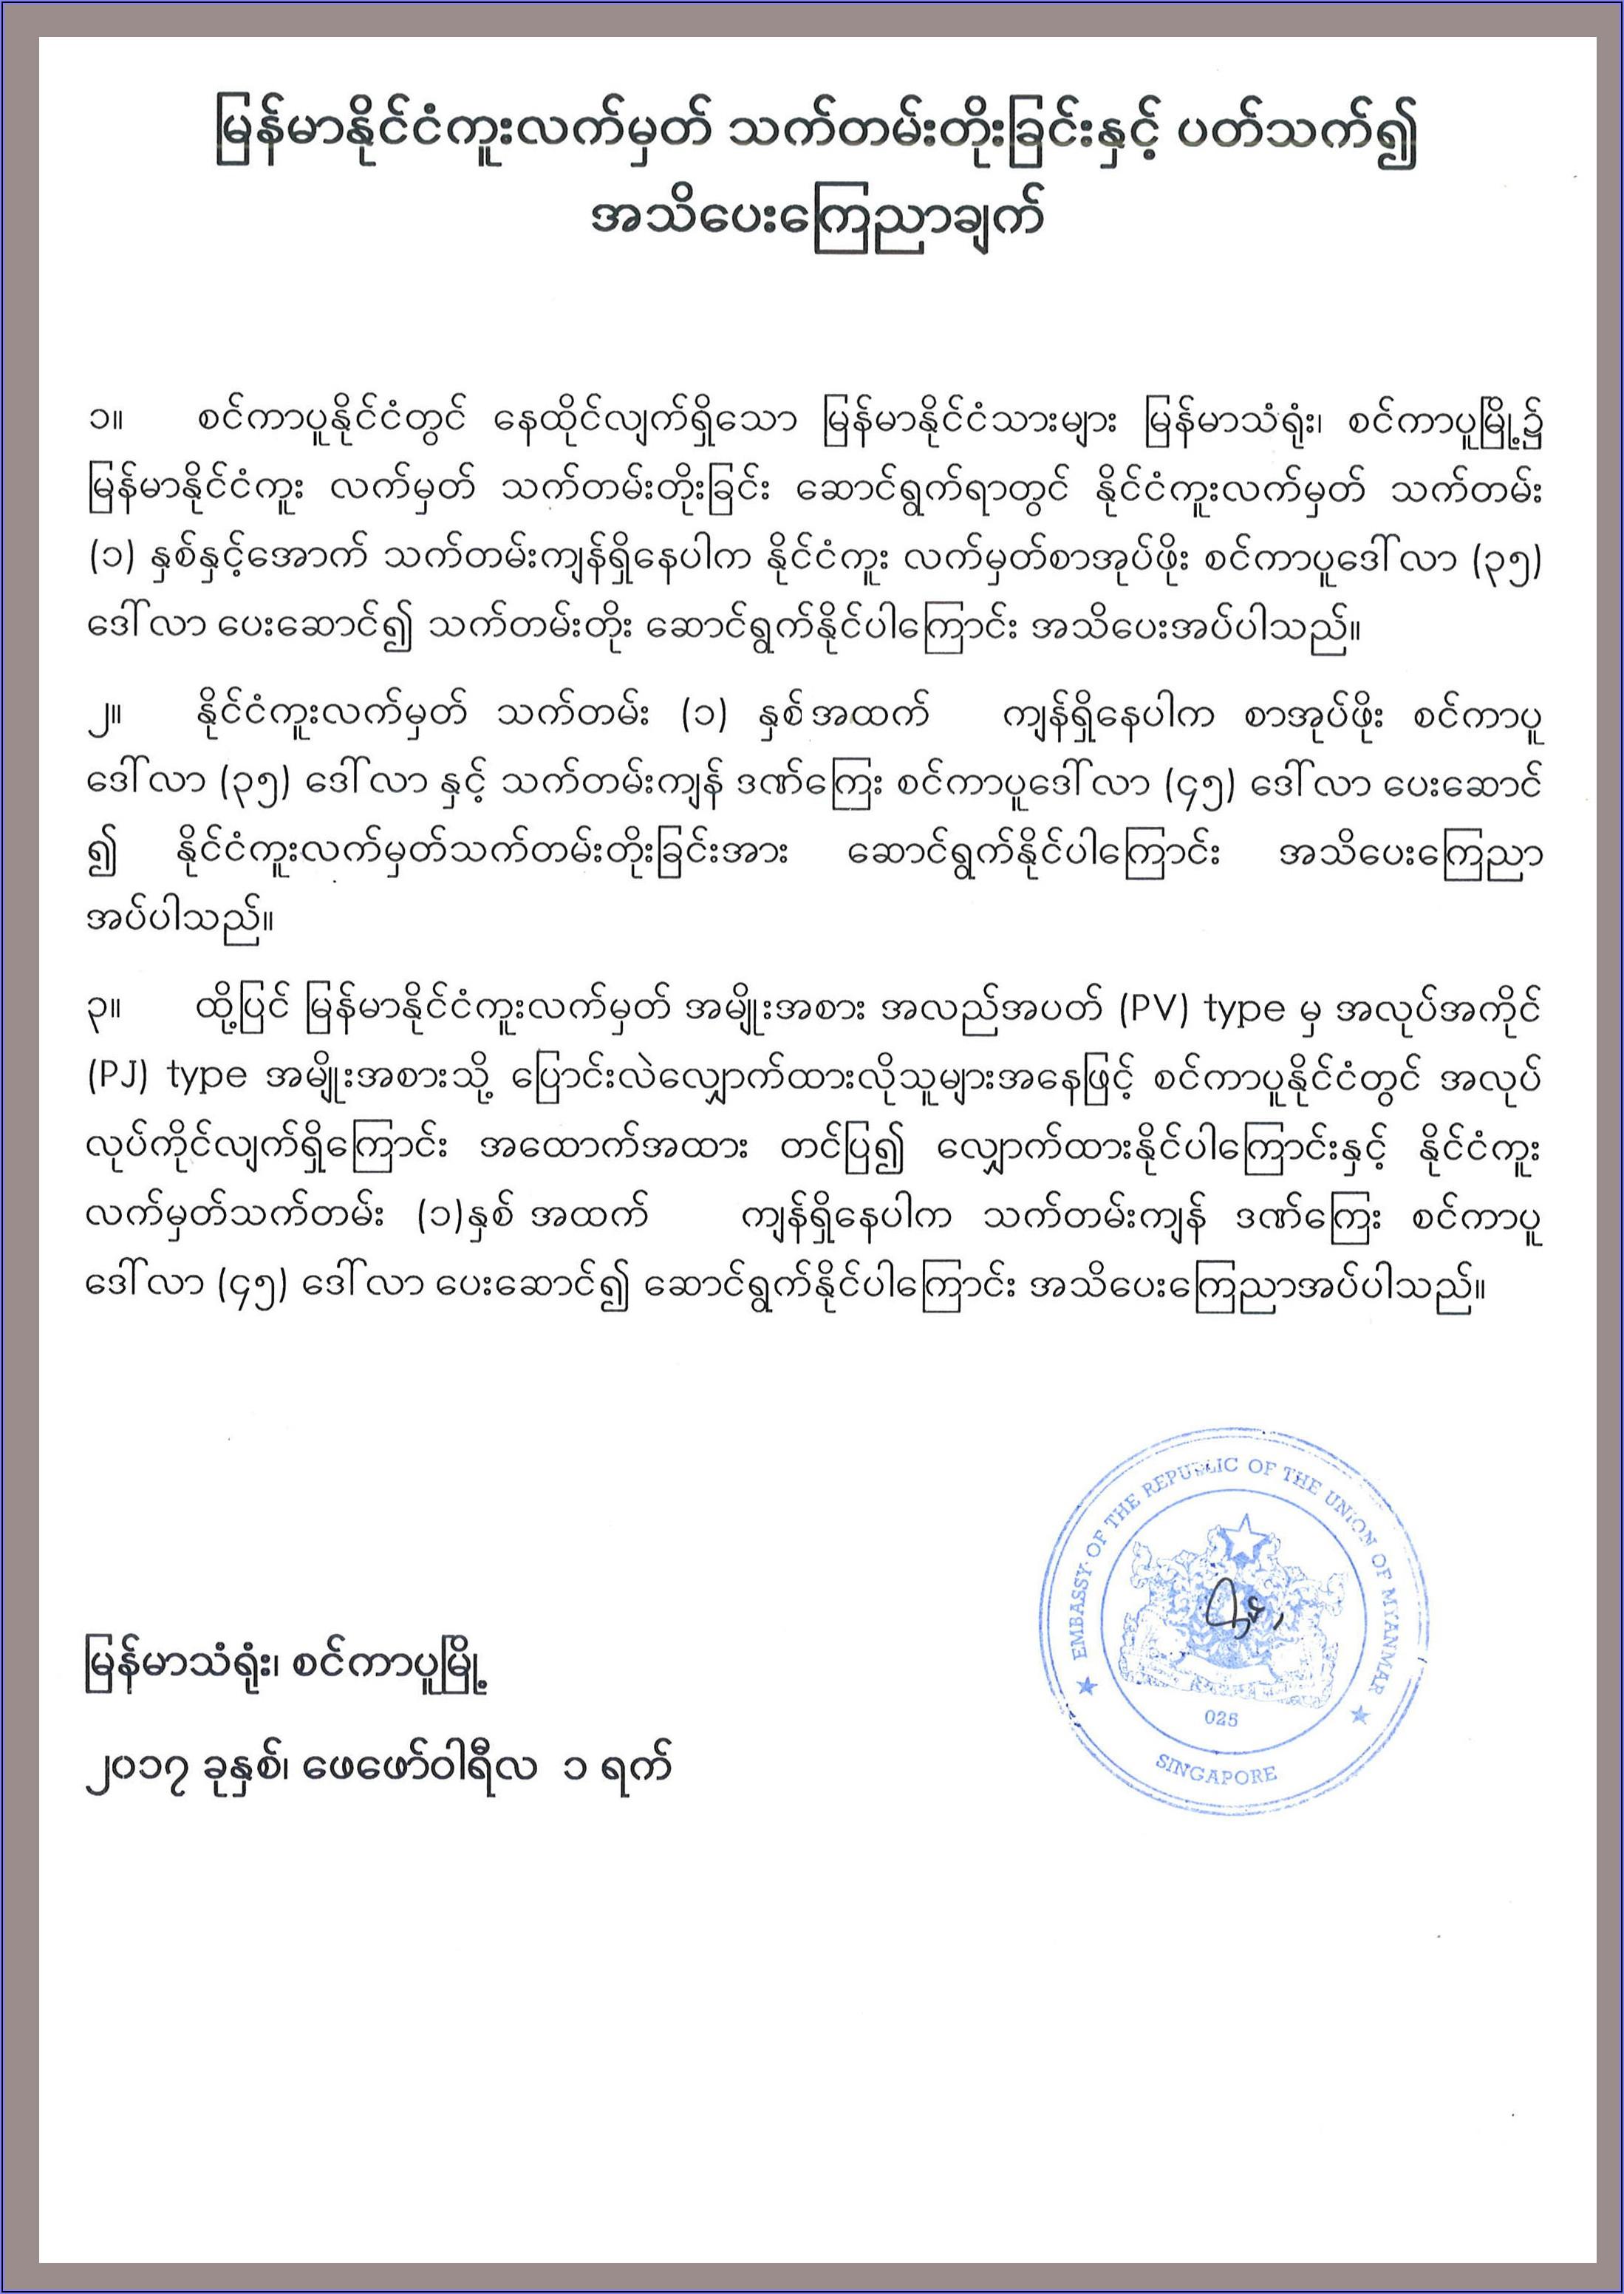 Myanmar Embassy Singapore Visa Application Form